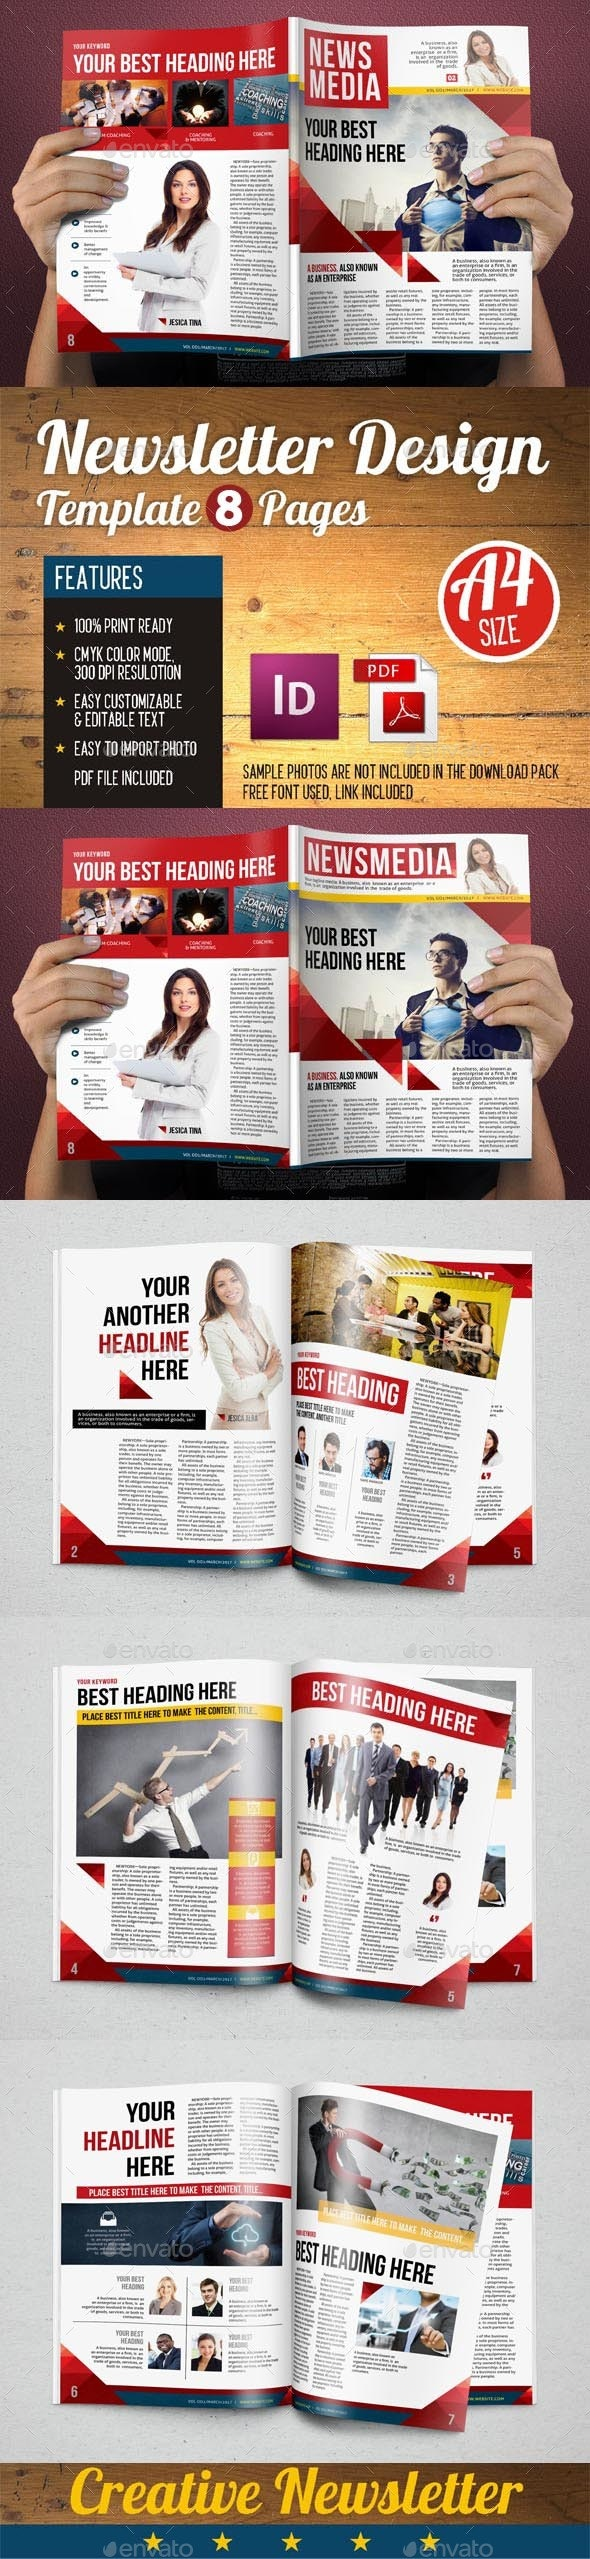 Newsletter Design Template vol 5 - Newsletters Print Templates